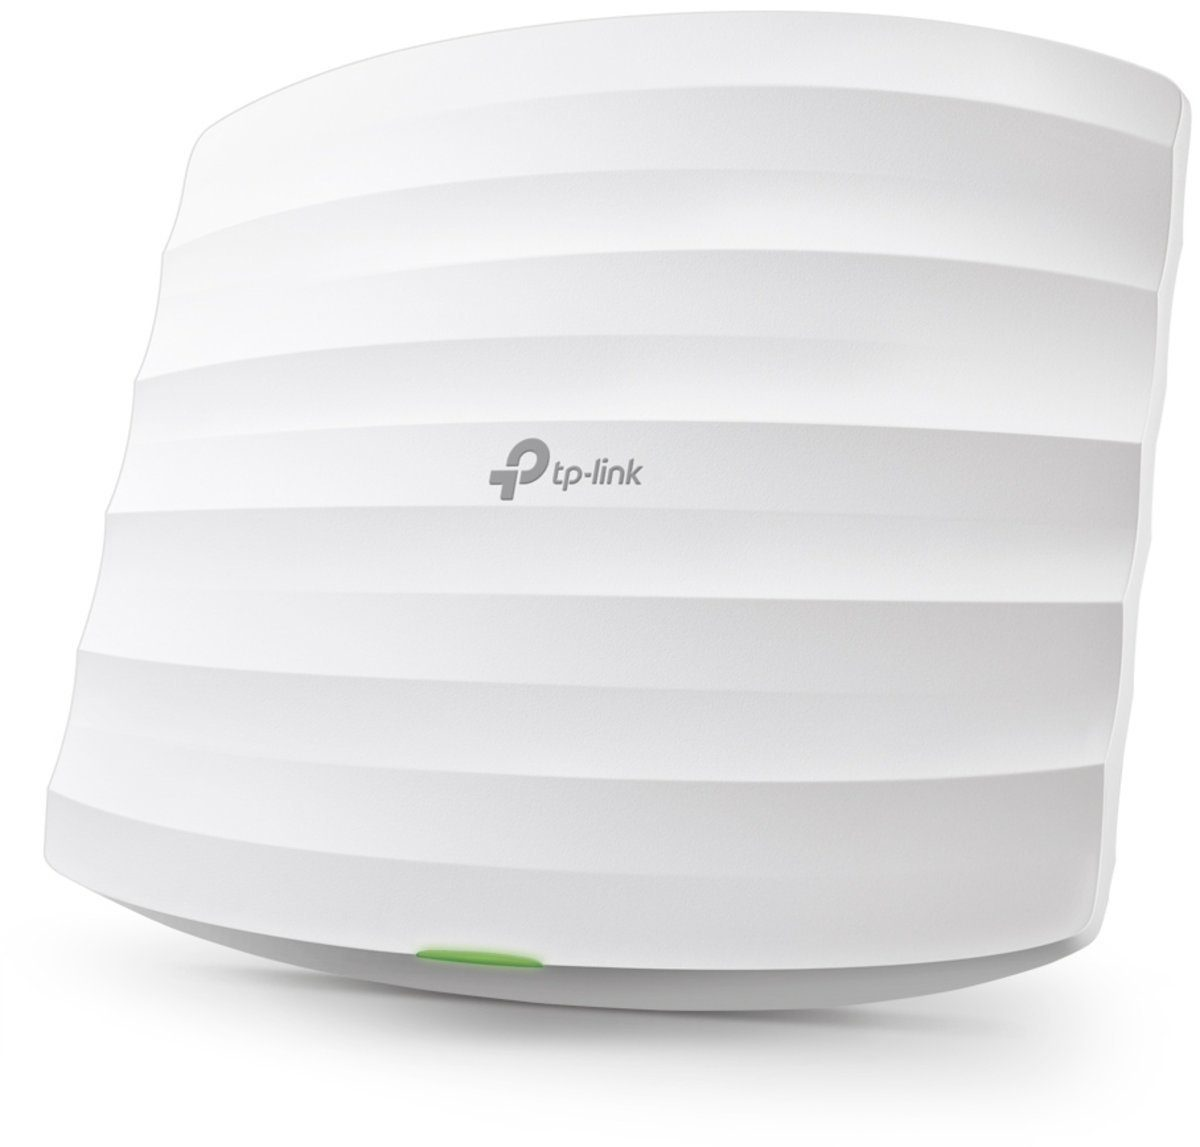 TP-Link WLAN Access-Point »EAP245 V3 2,4 & 5GHz 1300MBit/s WLAN Access Point«